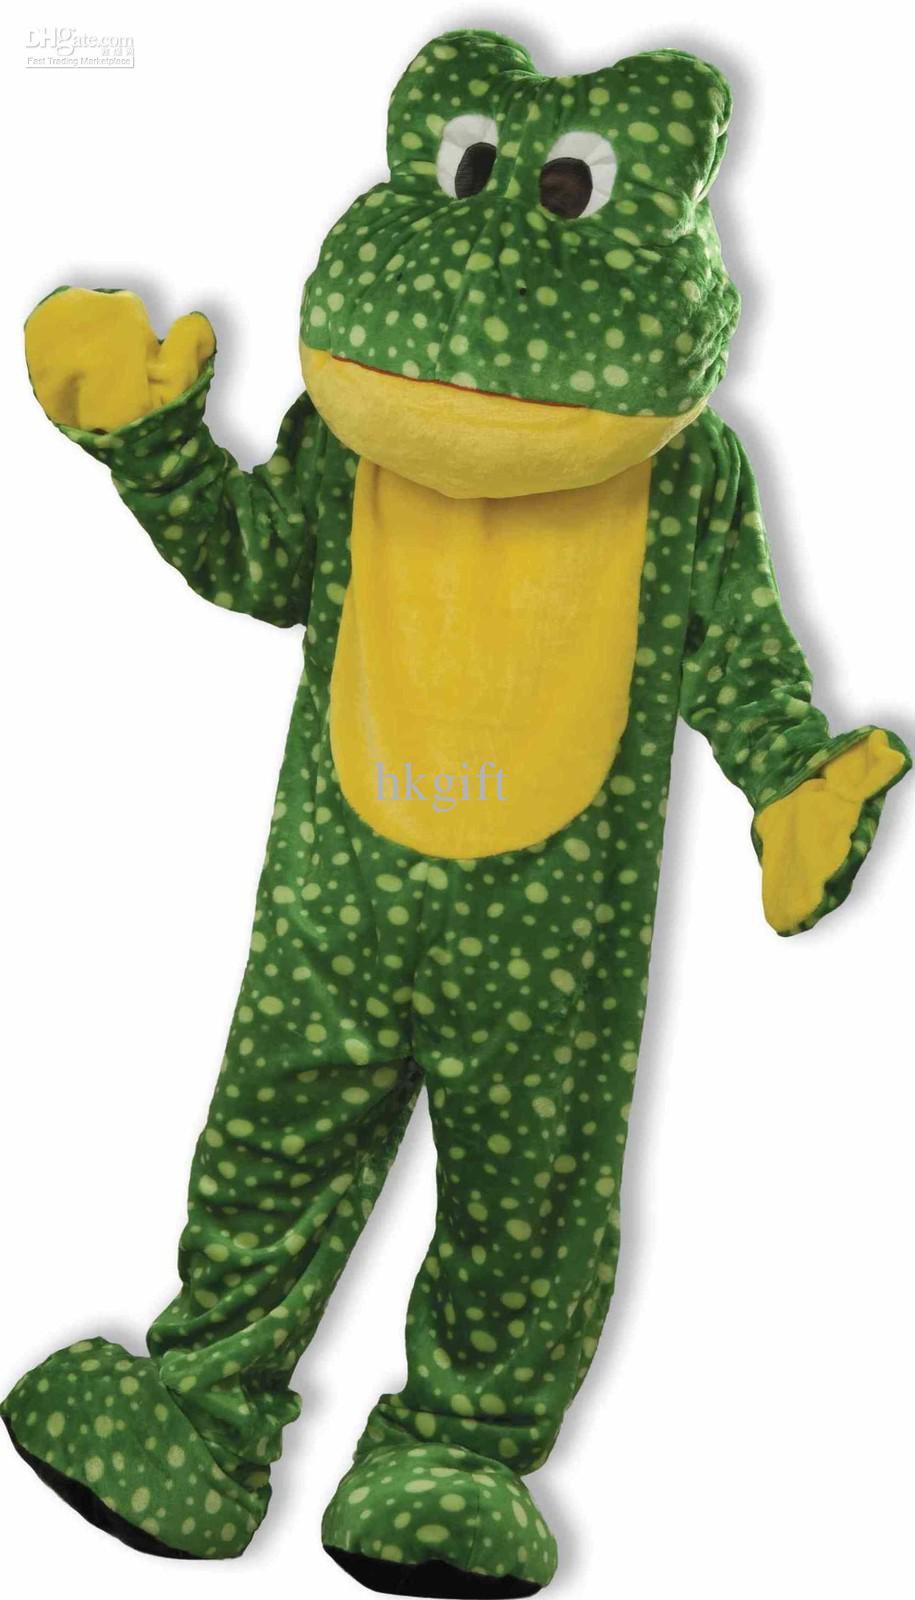 Green Frog Mascot Costume Adults Halloween Party Cartoon School.